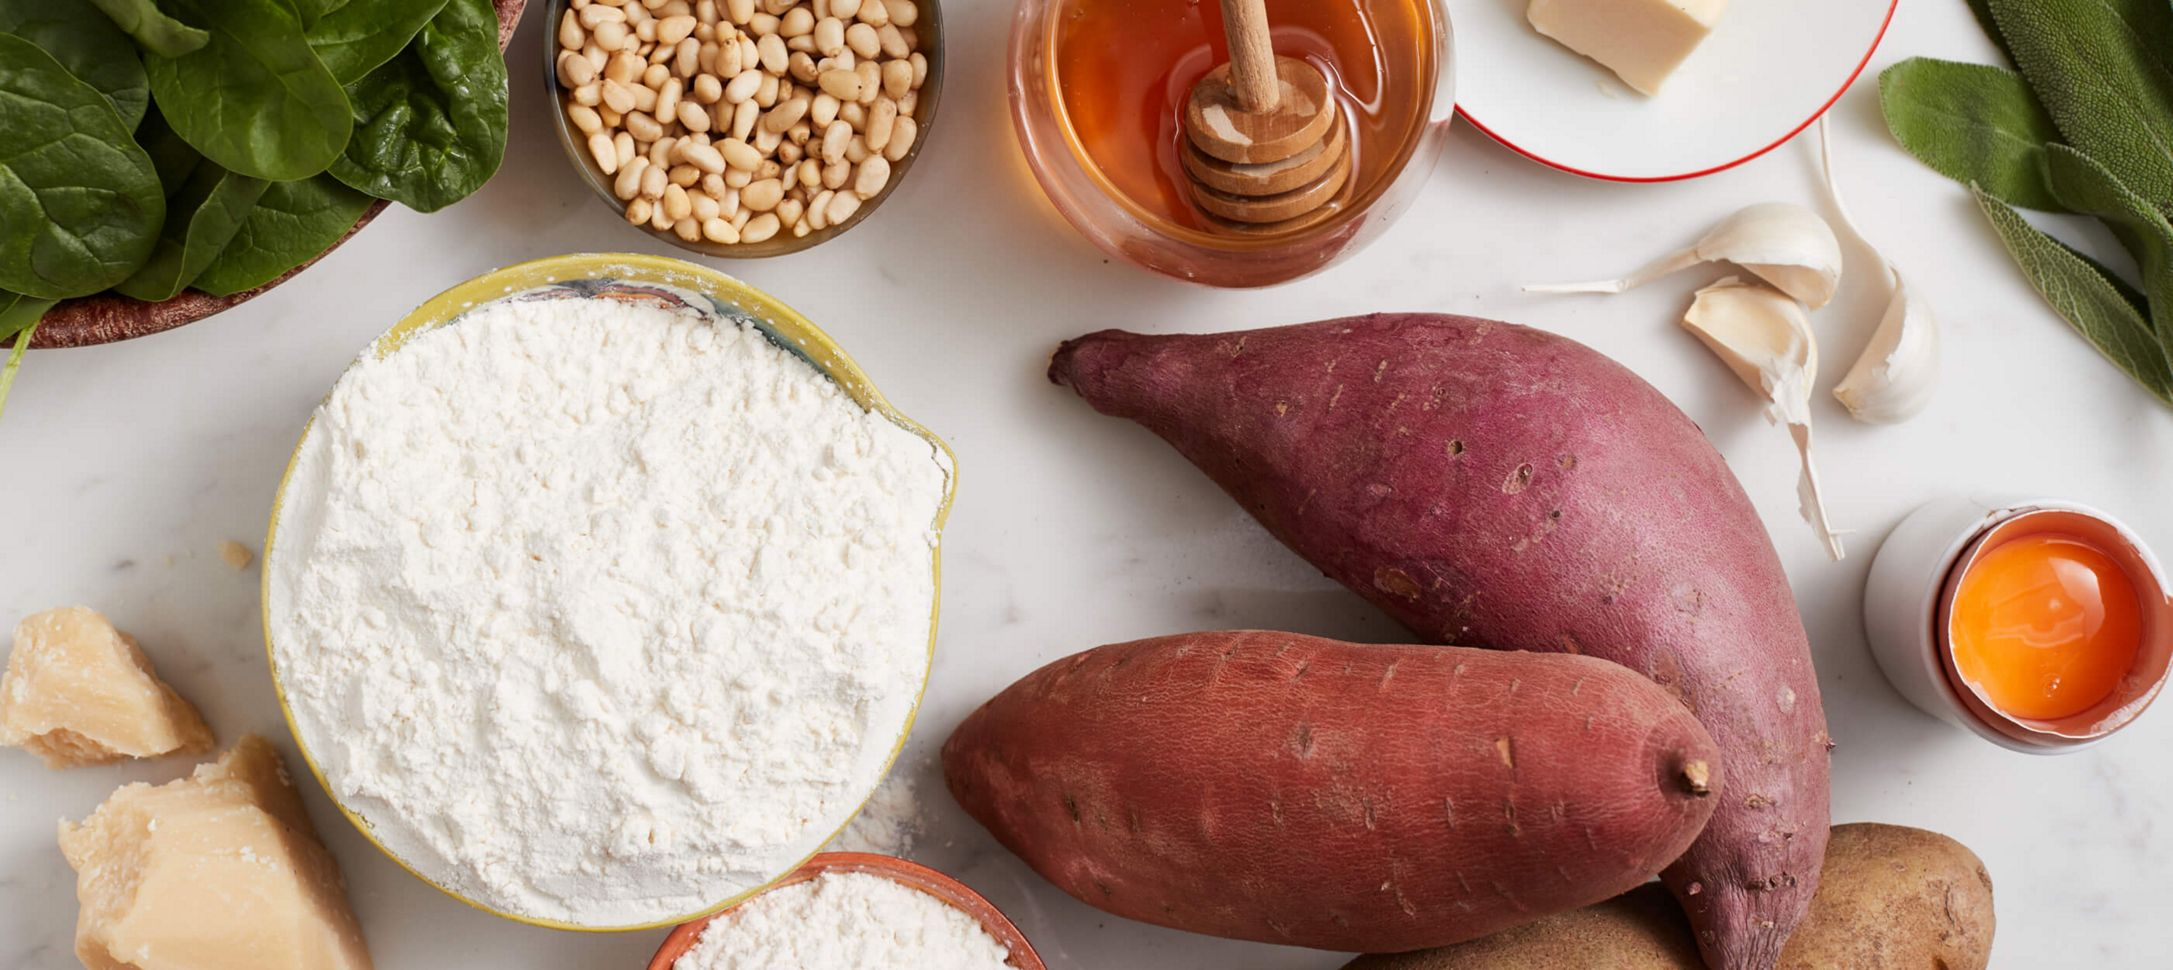 White Countertop with various ingredients, including fresh basil, garlic, flour, sweet potates, flour and honey